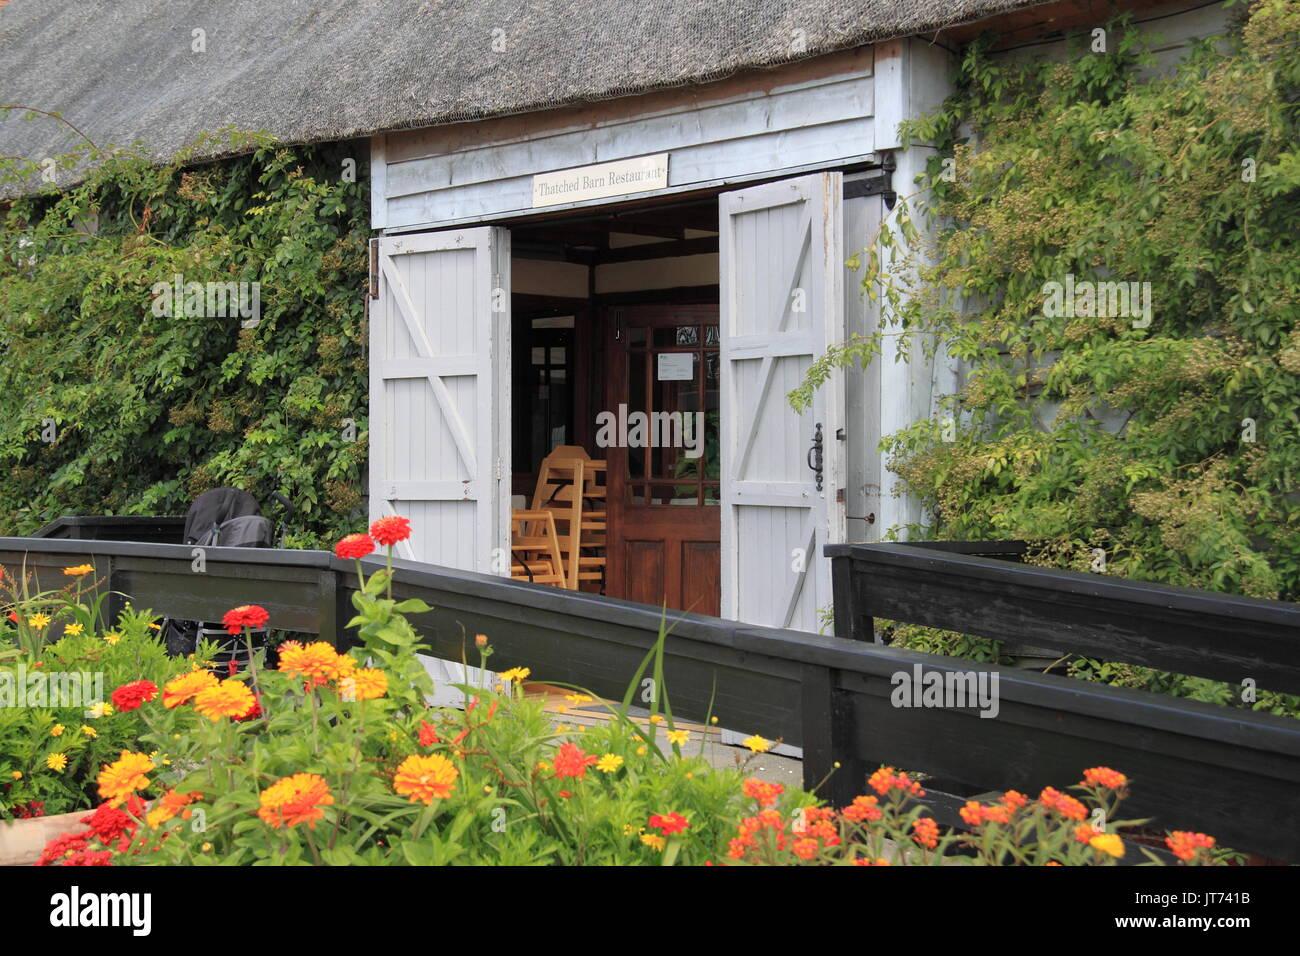 Restaurant Barn Stock Photos & Restaurant Barn Stock Images - Alamy